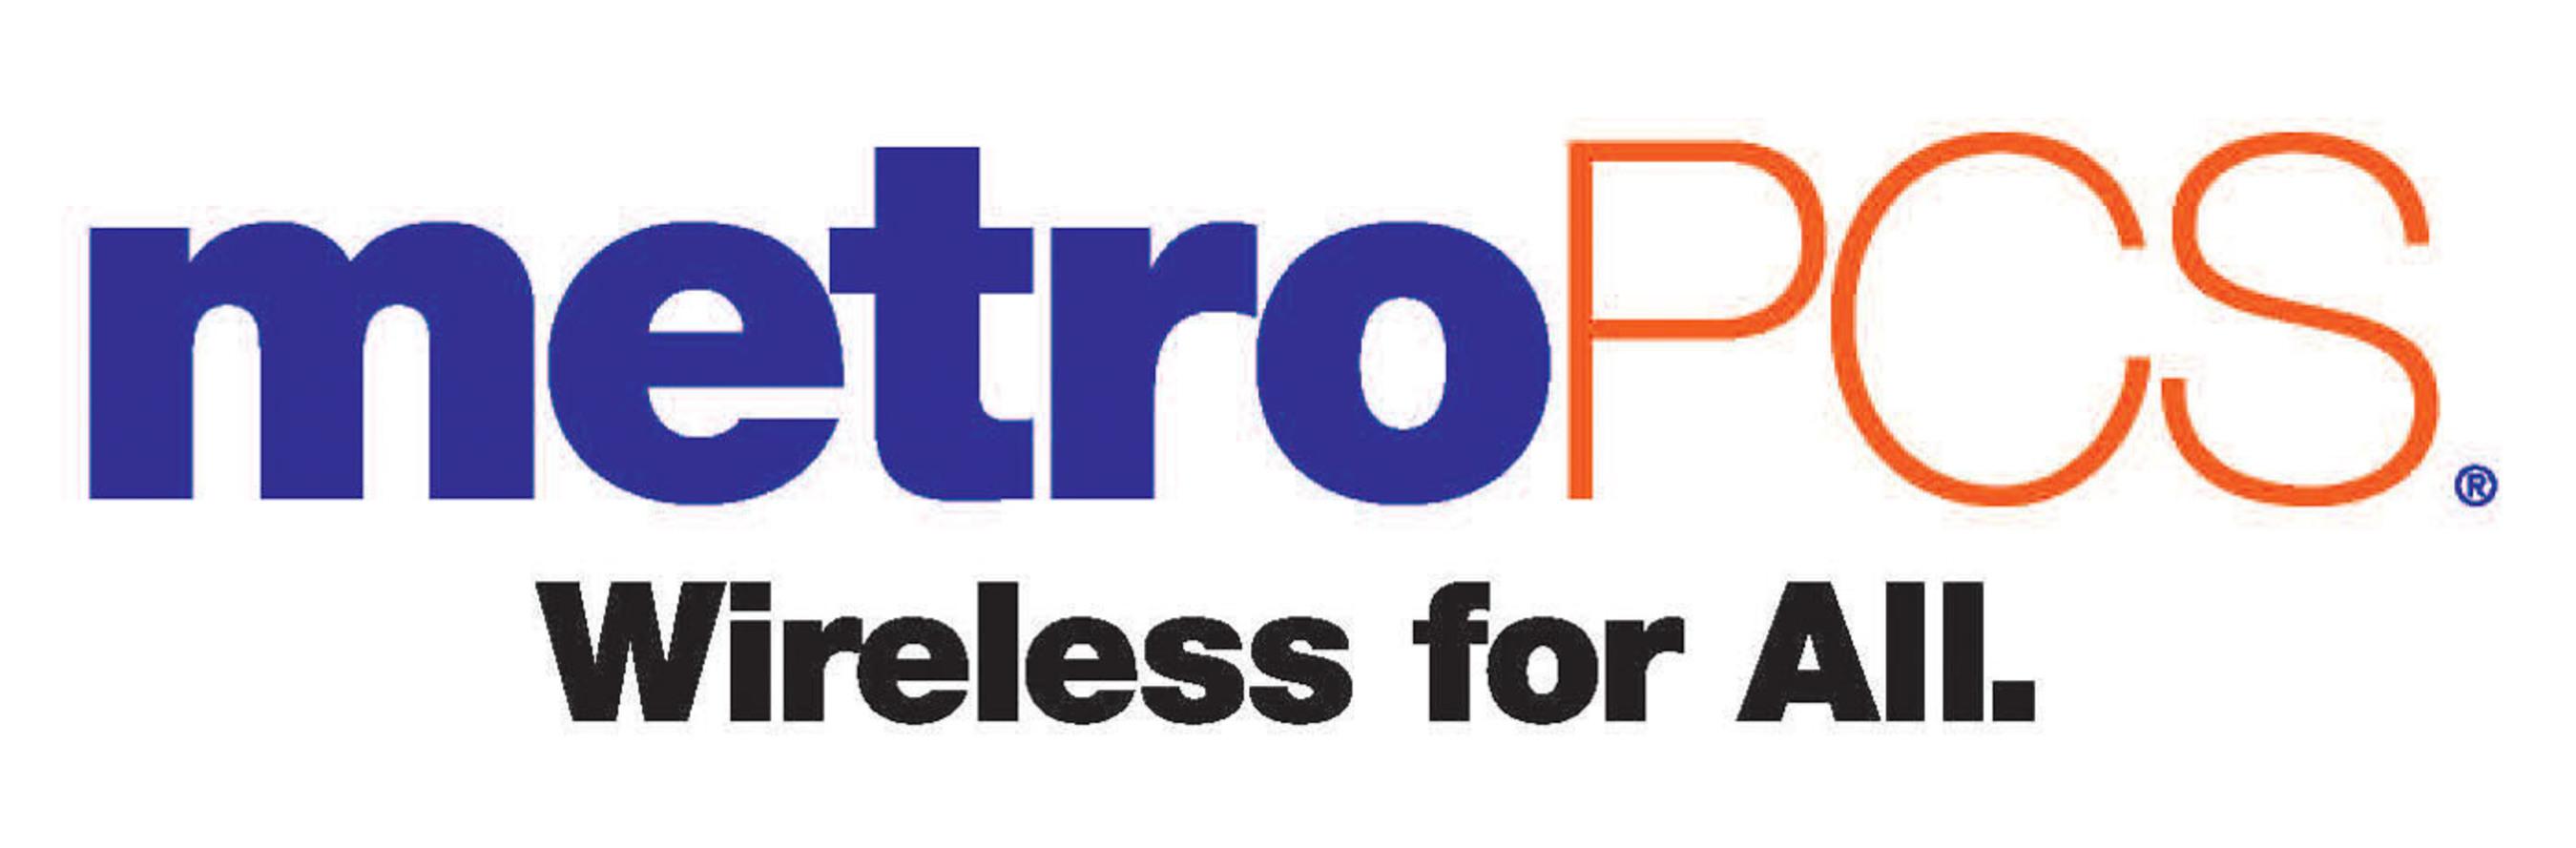 MetroPCS logo. (PRNewsFoto/MetroPCS Communications, Inc.) (PRNewsFoto/)